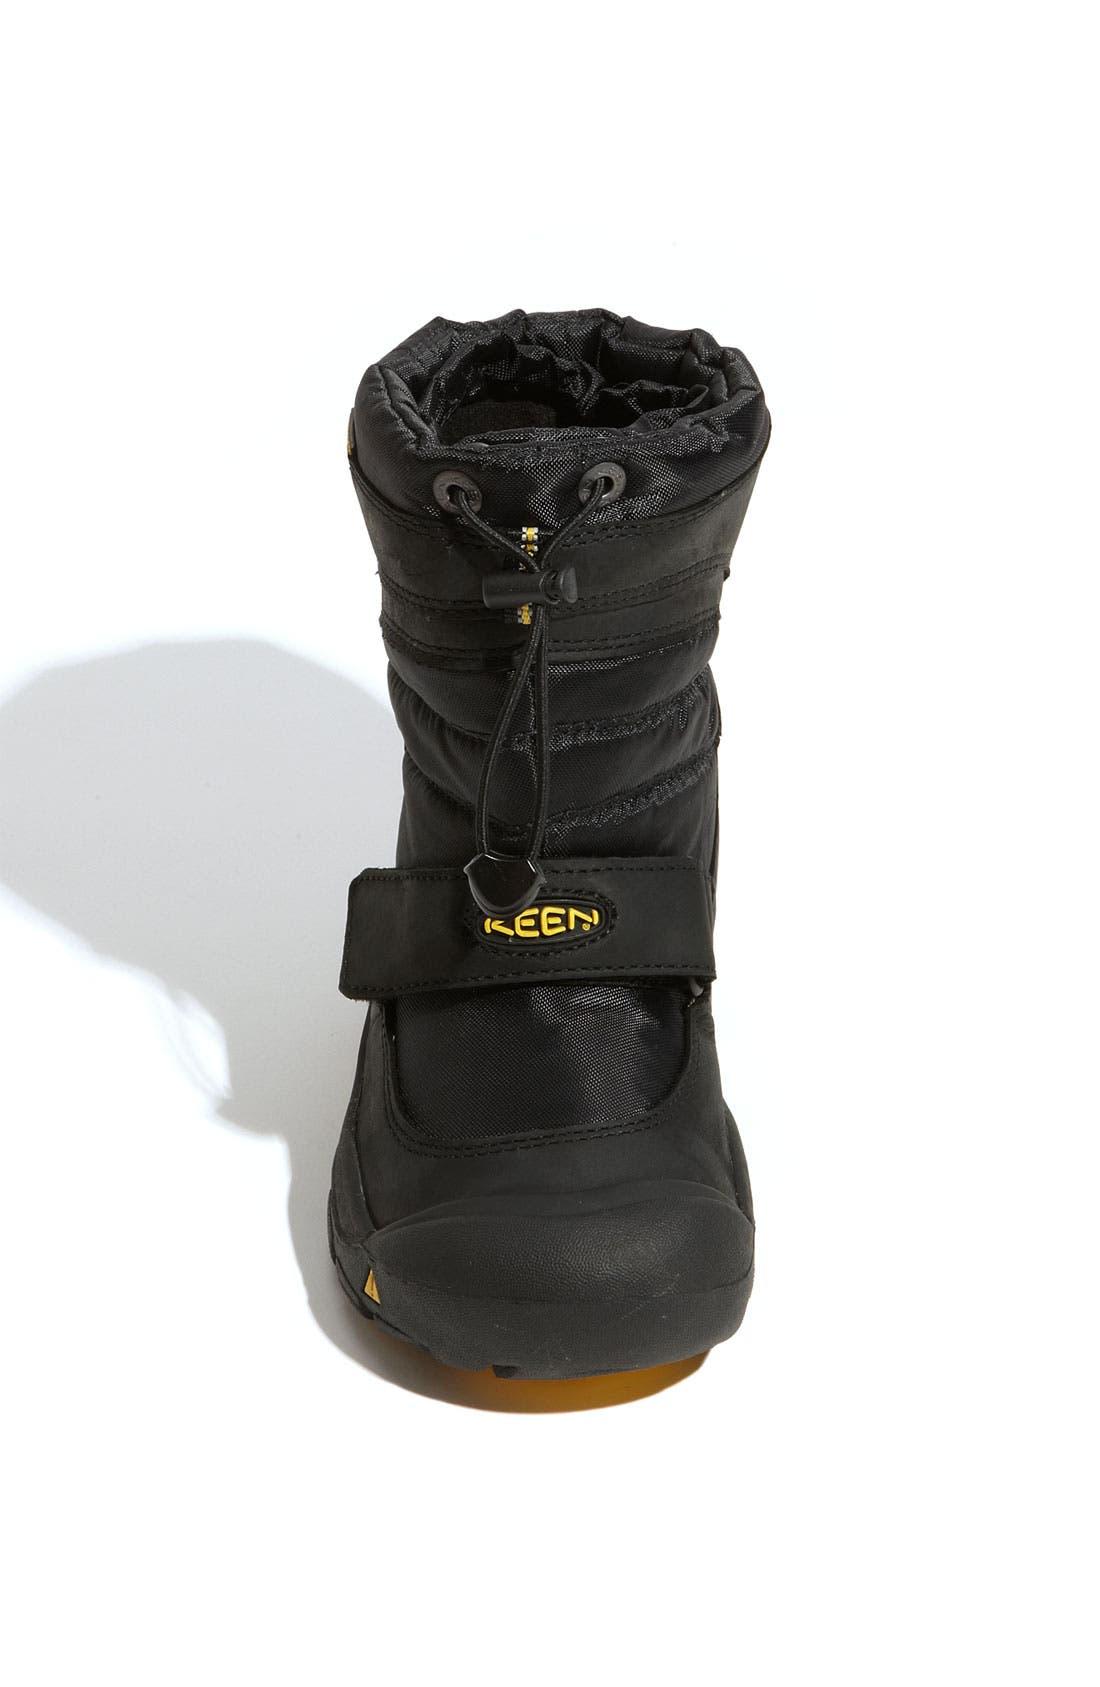 Alternate Image 3  - Keen 'Breckenridge' Waterproof Boot (Toddler, Little Kid & Big Kid)